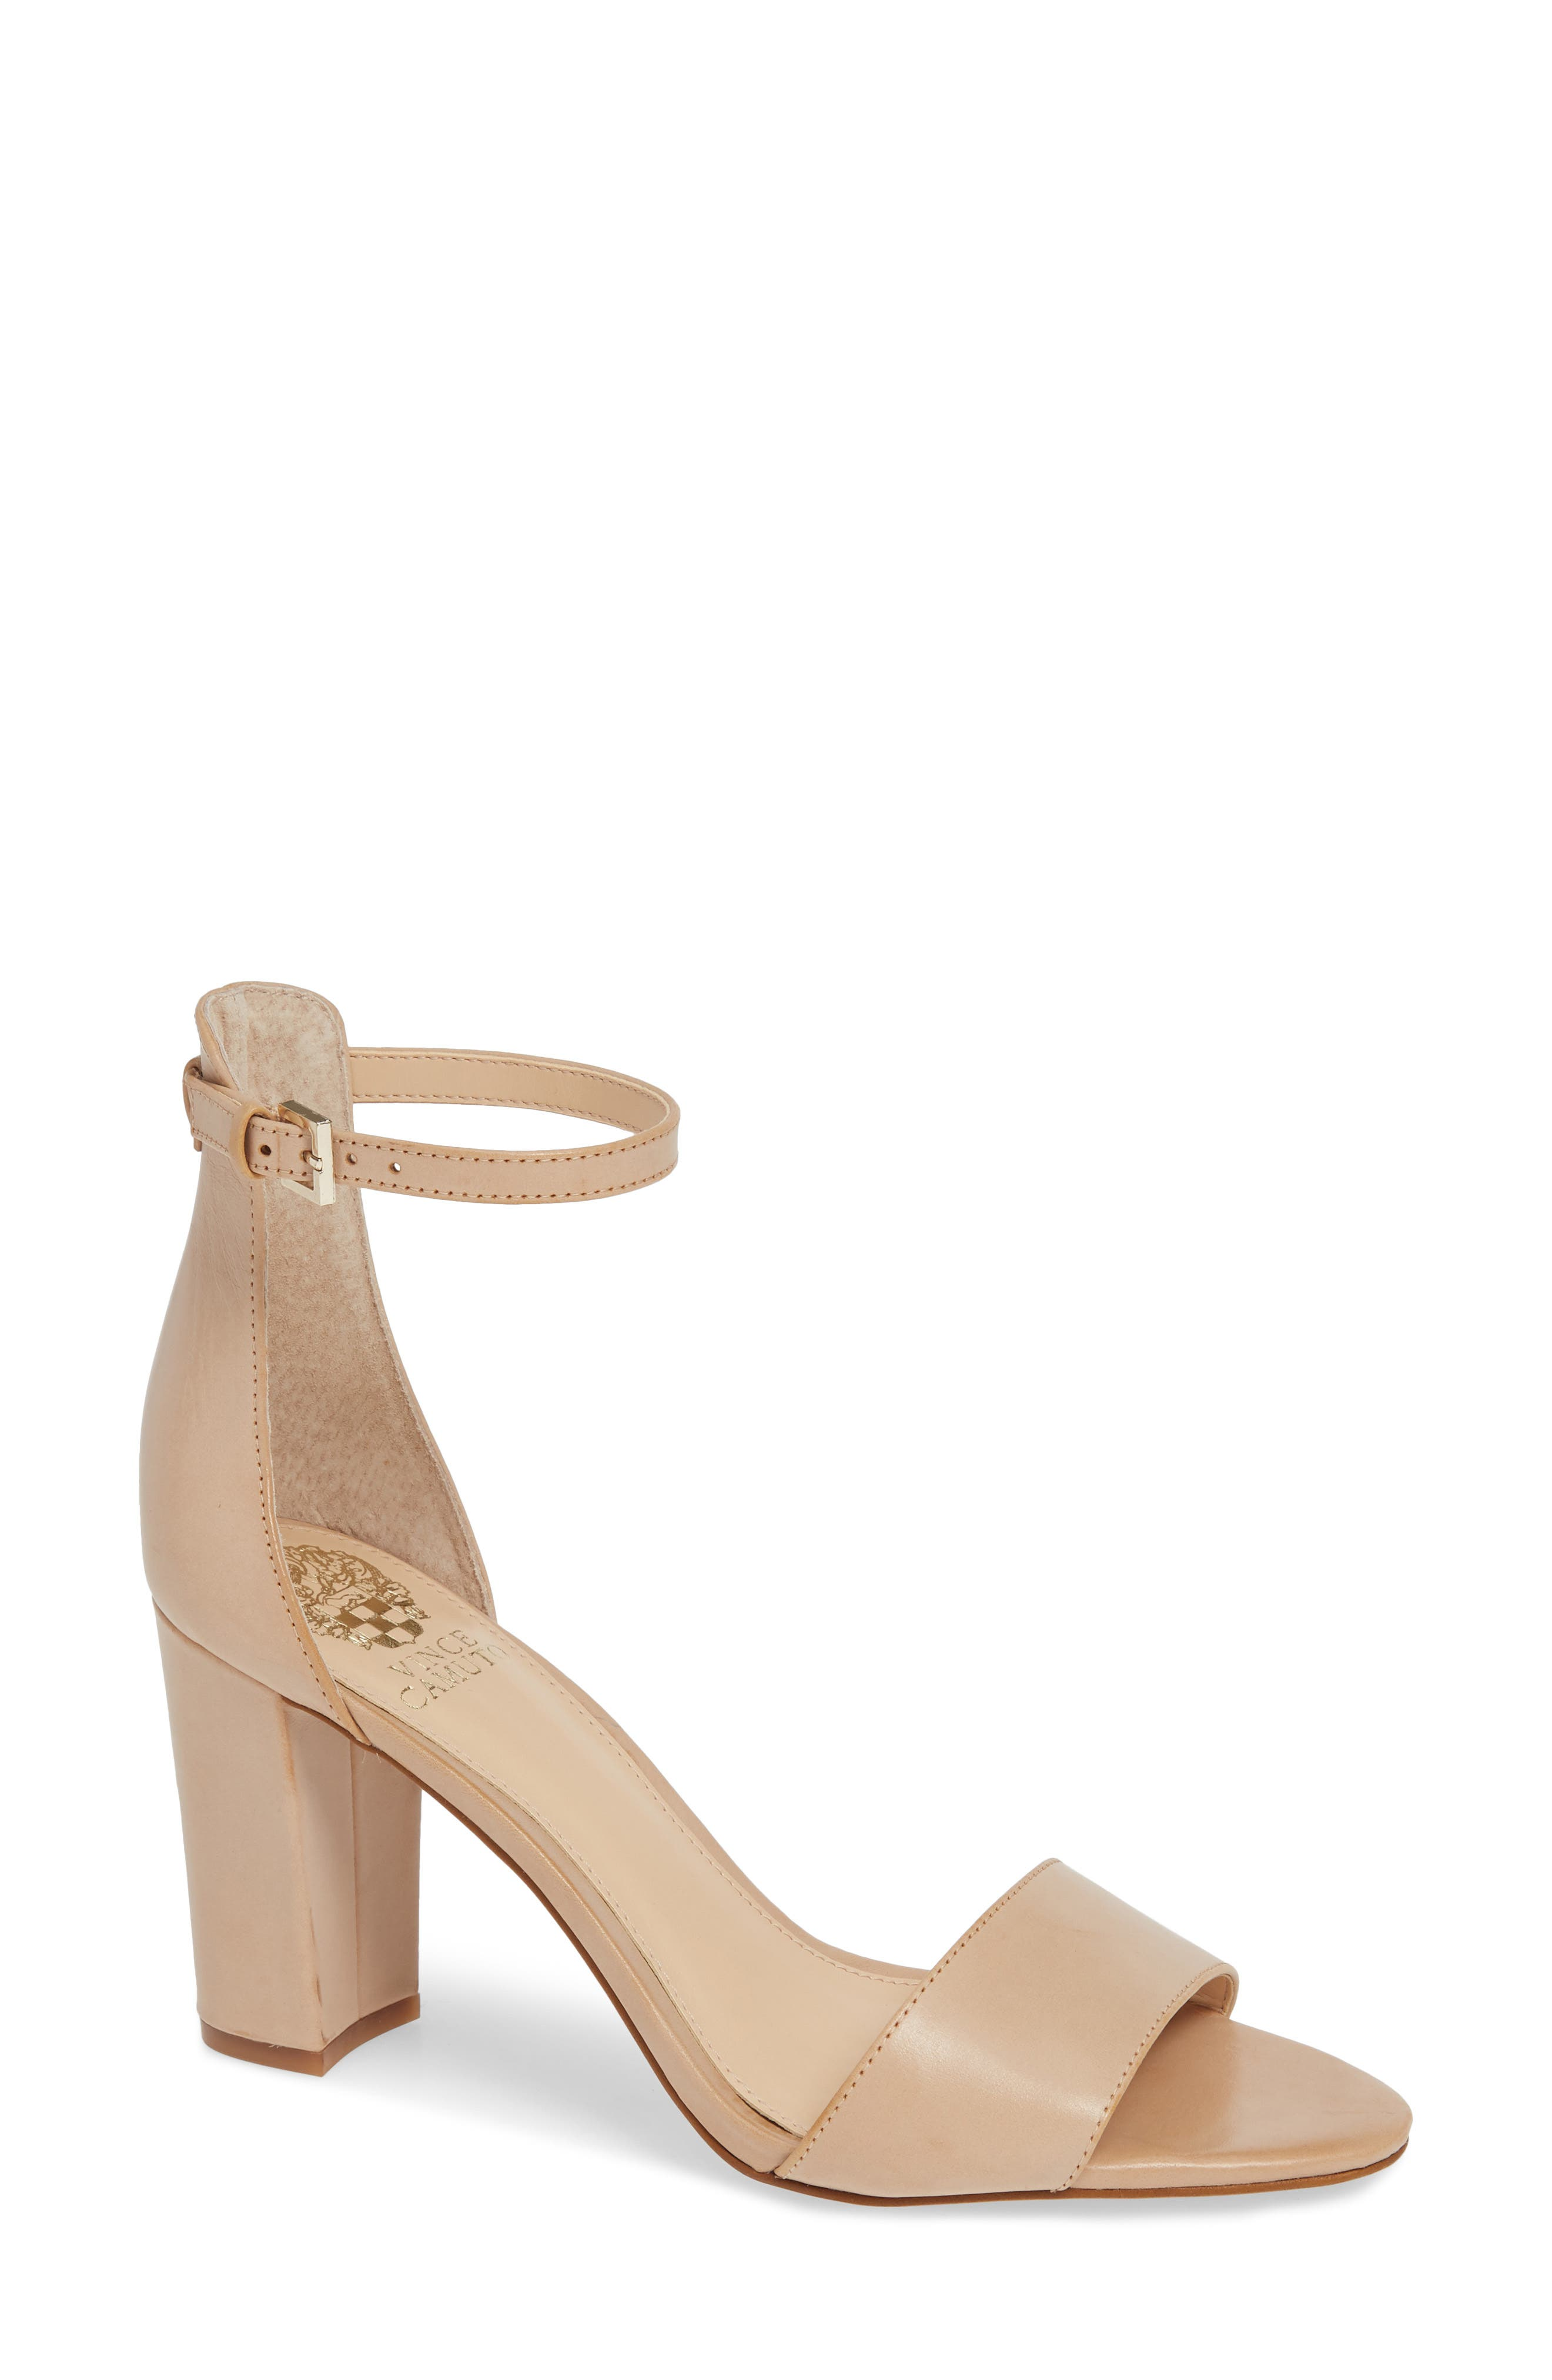 Image of Vince Camuto Corlina Ankle Strap Sandal